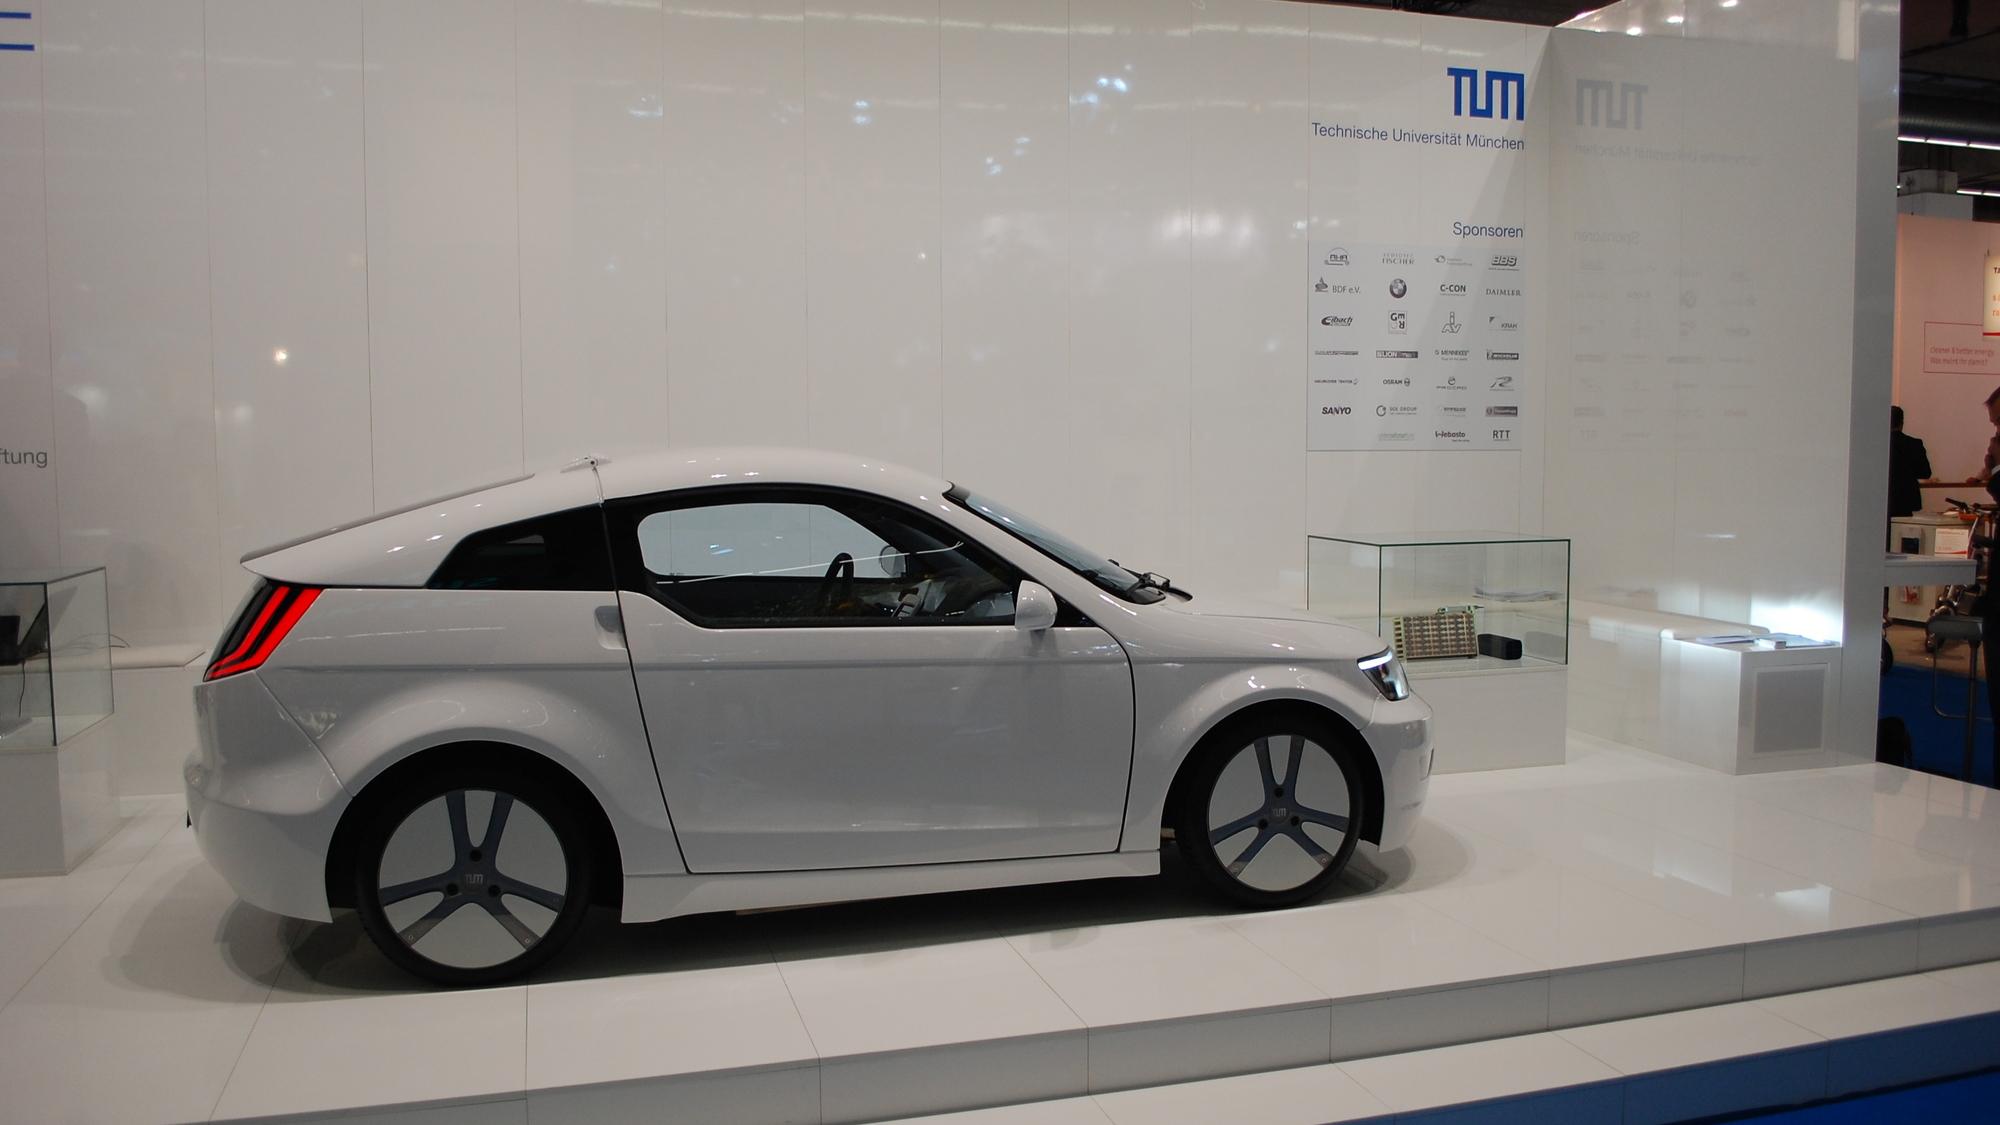 Munich University's Mute concept